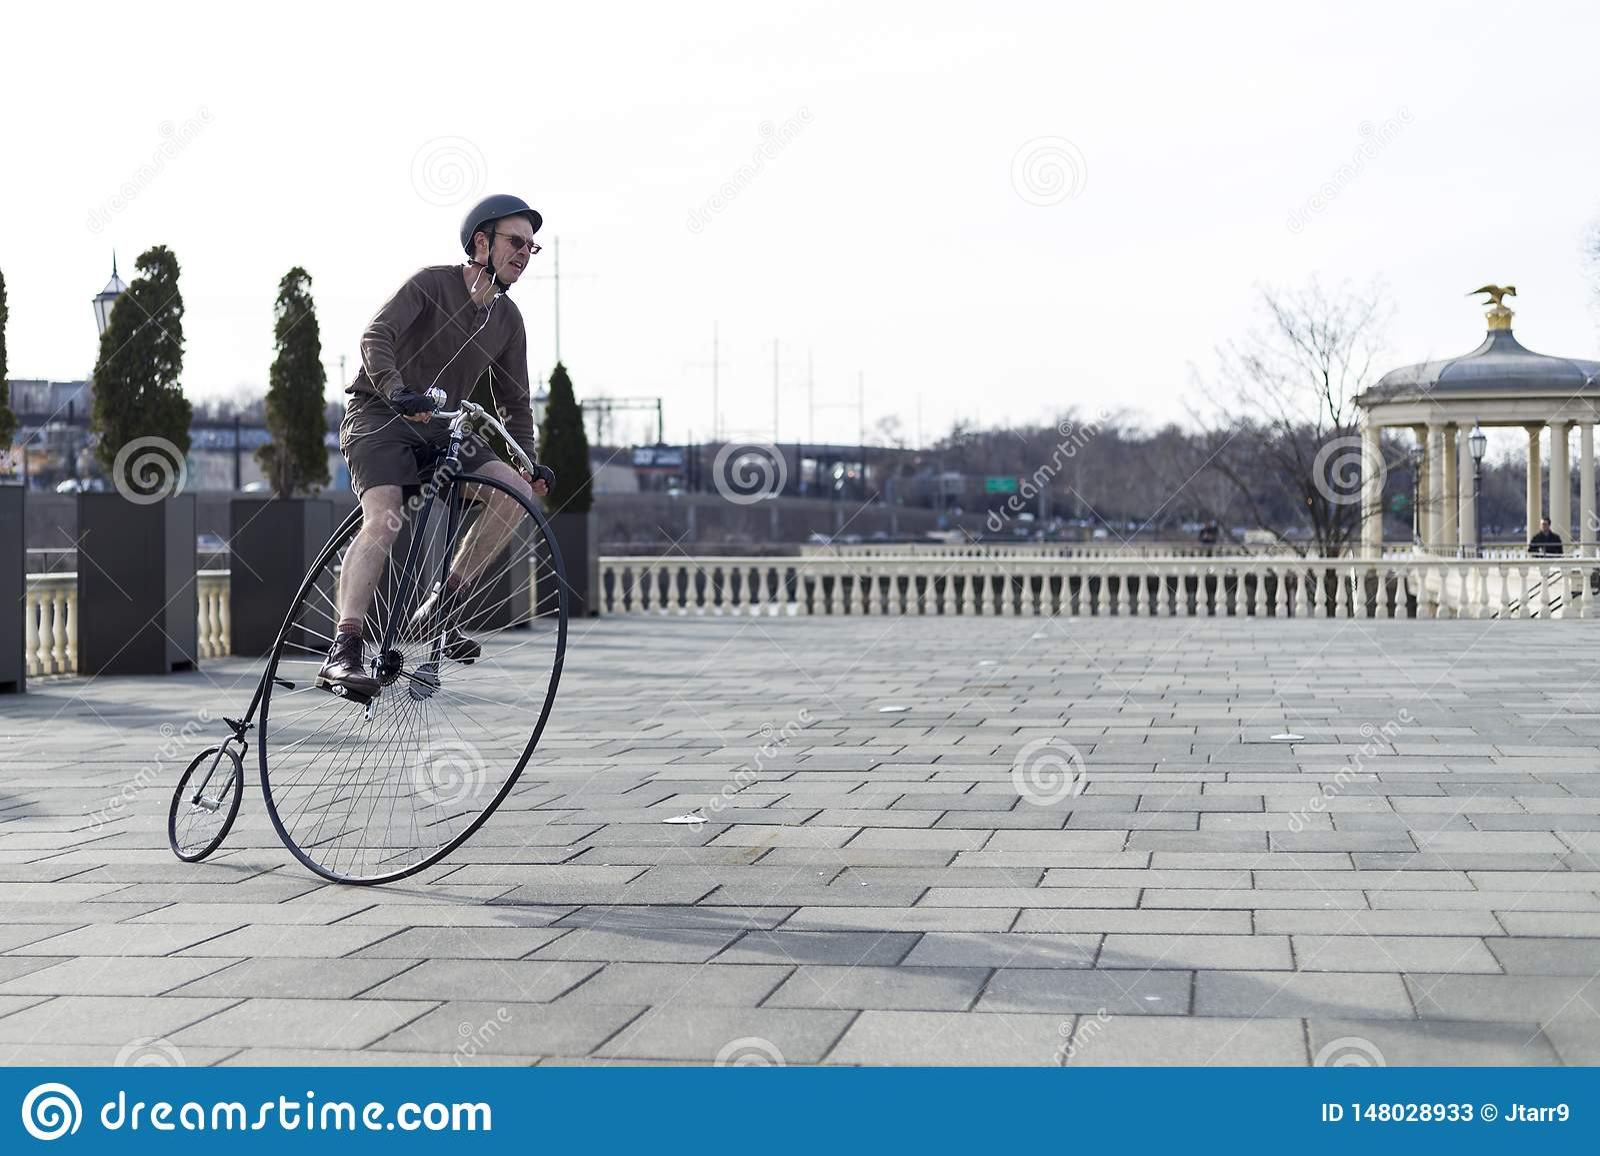 Penny Farthing Bicycle in Philadelphia